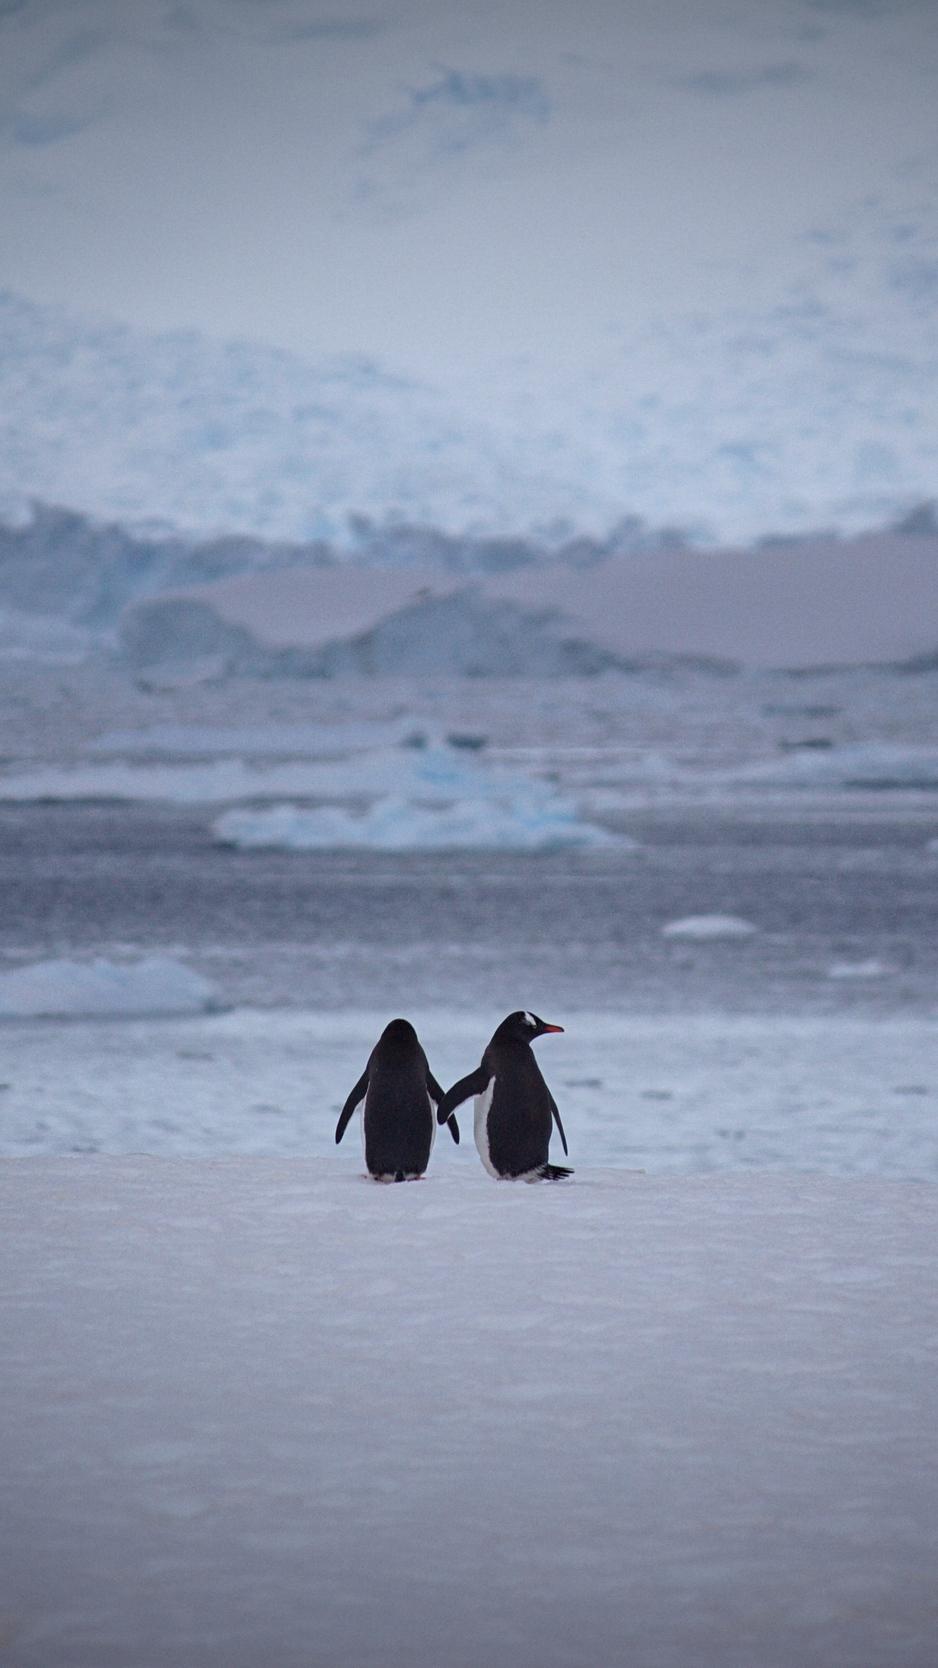 Download wallpaper 938x1668 penguins couple snow walk iphone 8 938x1668